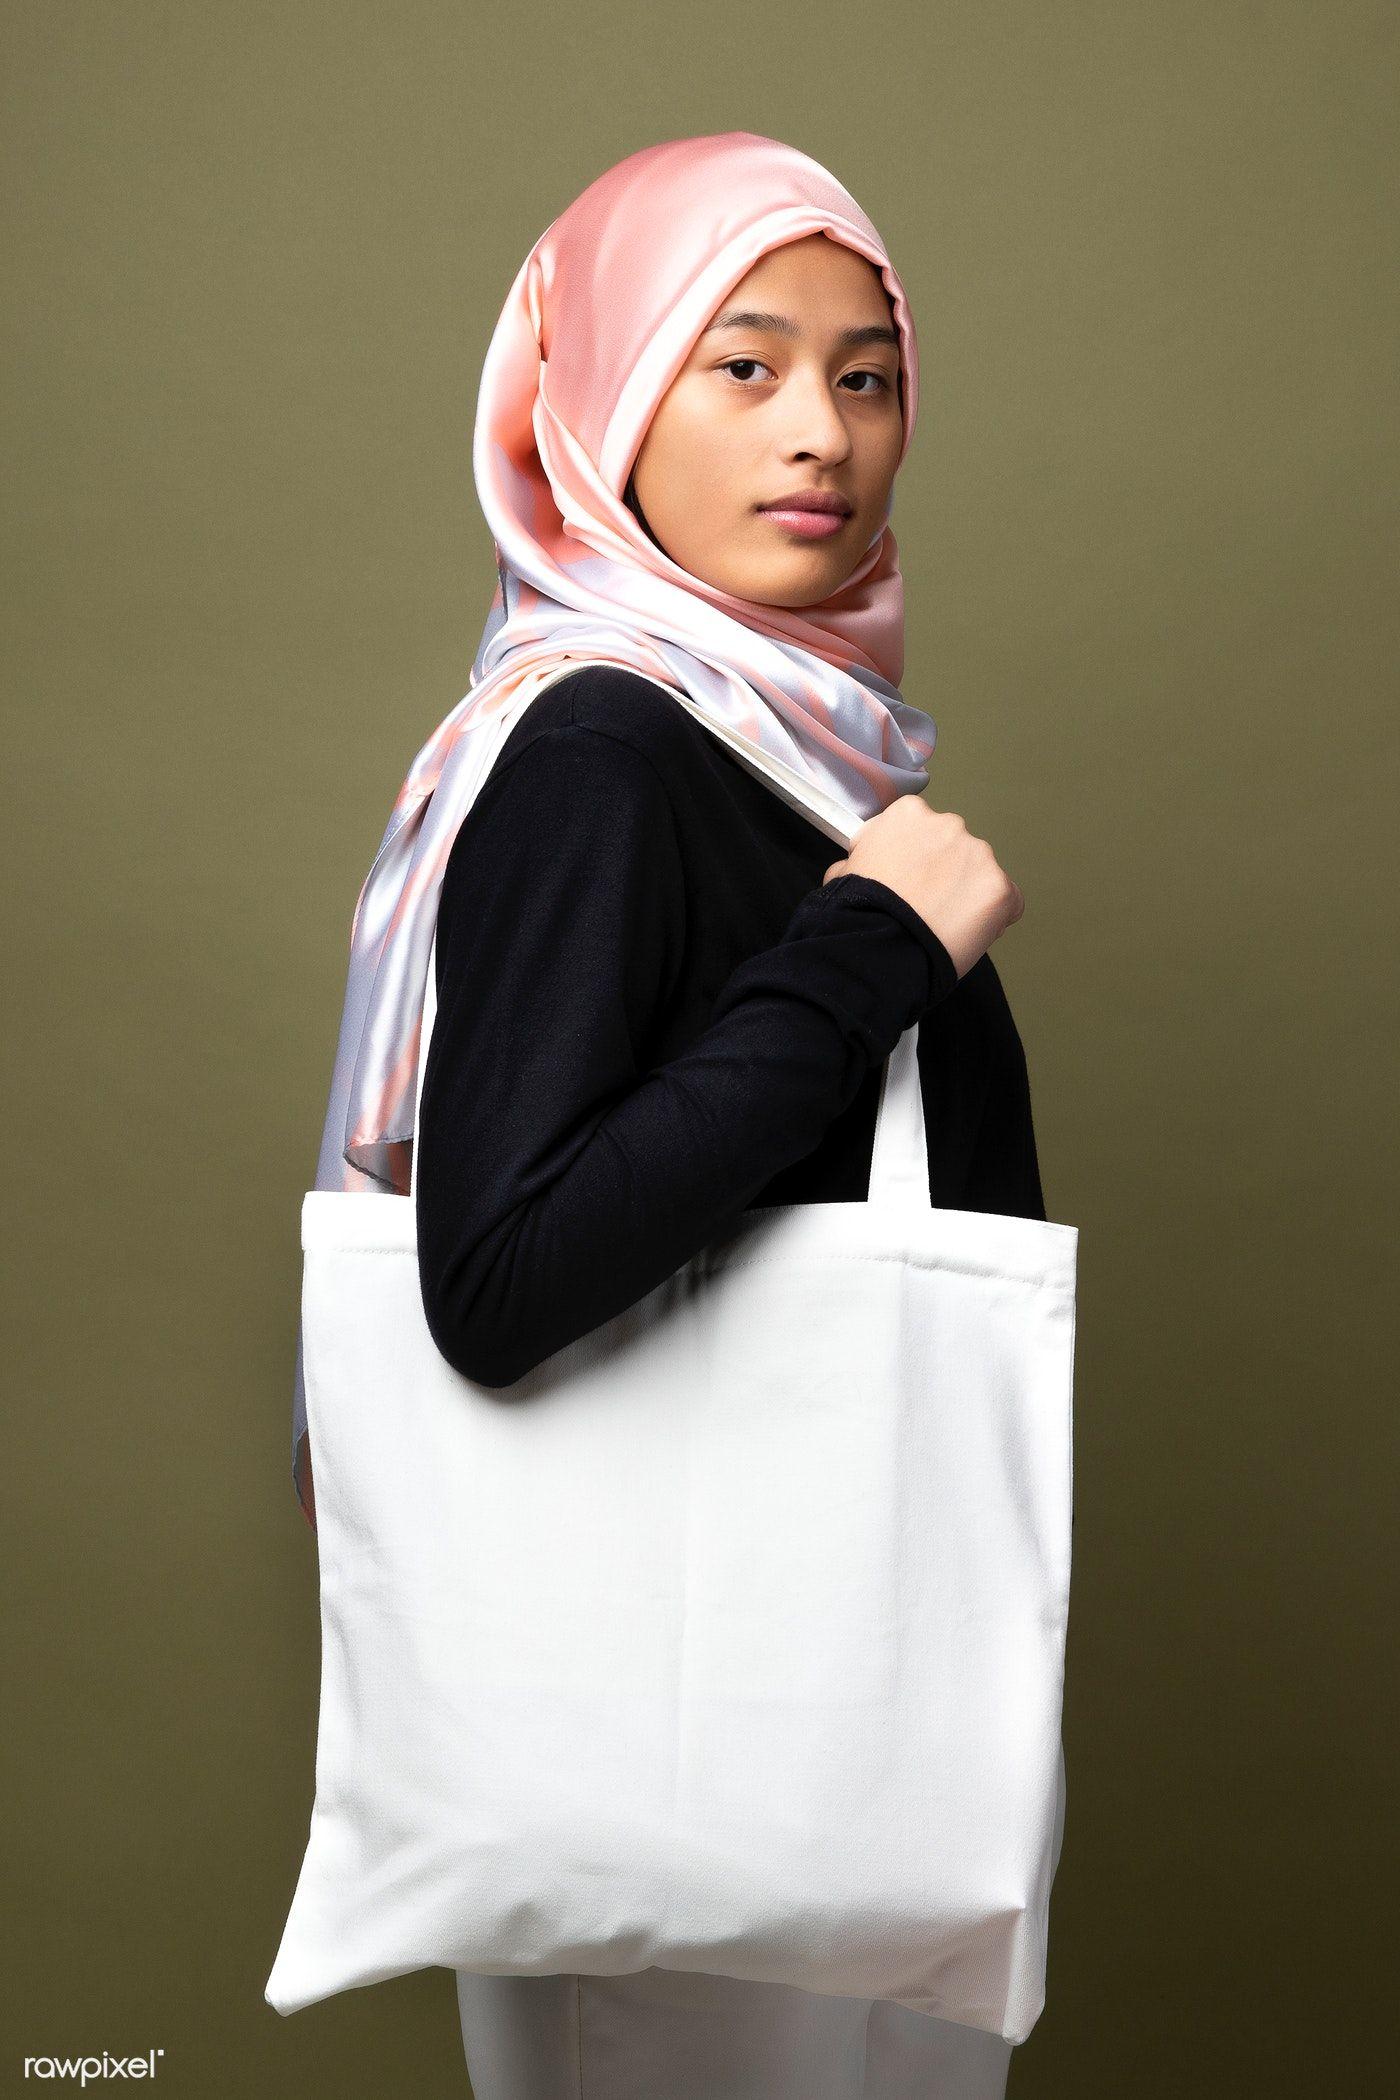 Download Download Premium Image Of Muslim Woman Carrying A White Tote Bag 2210594 White Tote Bag White Tote Muslim Women